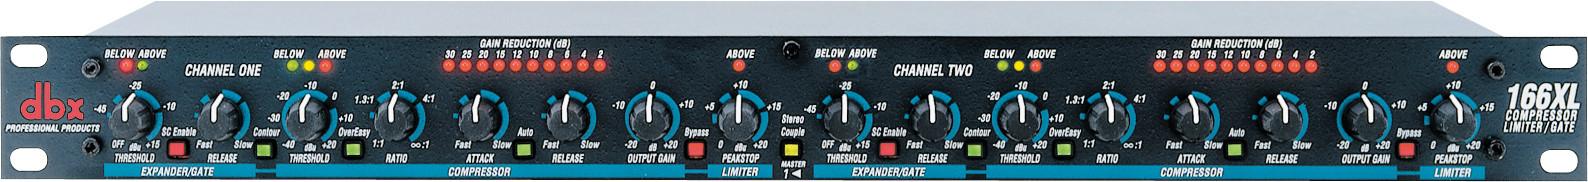 dbx 166XL Compressor/Expander/Gate